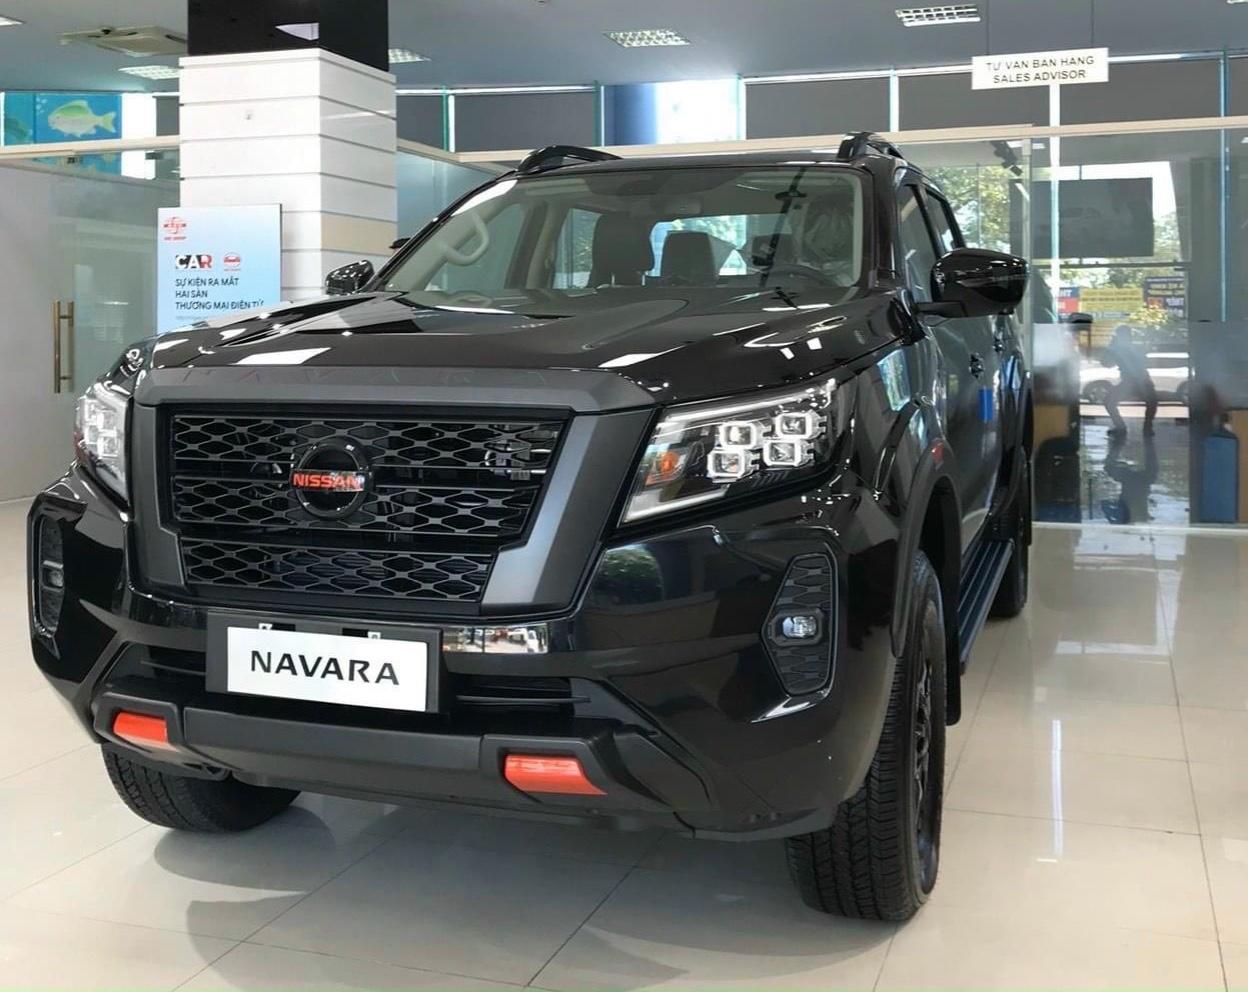 Bán tải Nissan Navara 2021